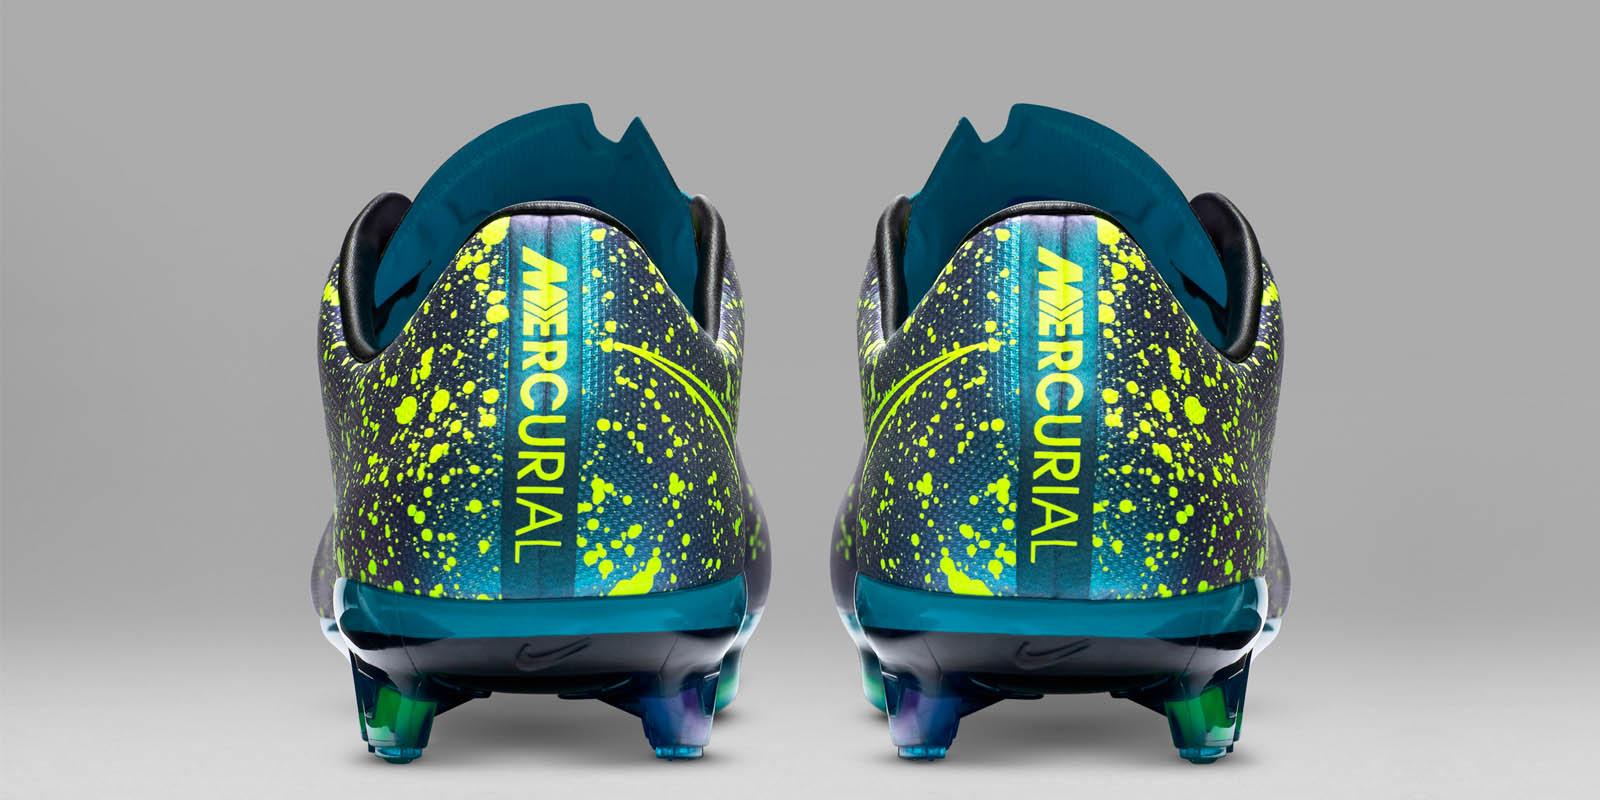 Nike Magista Football Boots at SportsDirect.com Ireland